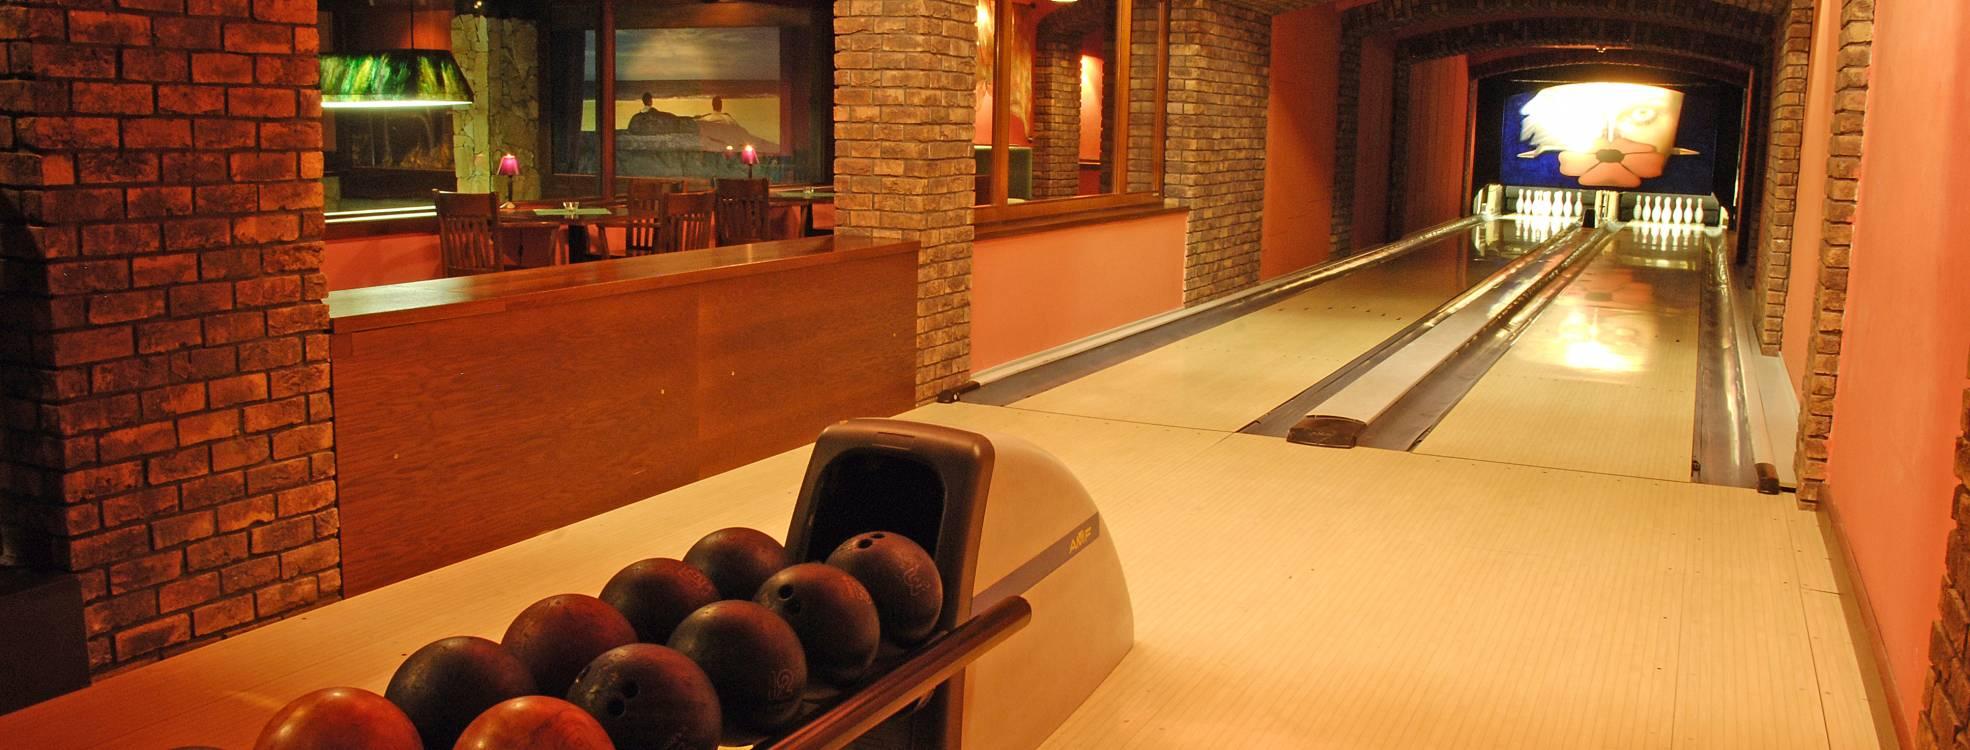 Bowling Hotel Partizán Tále